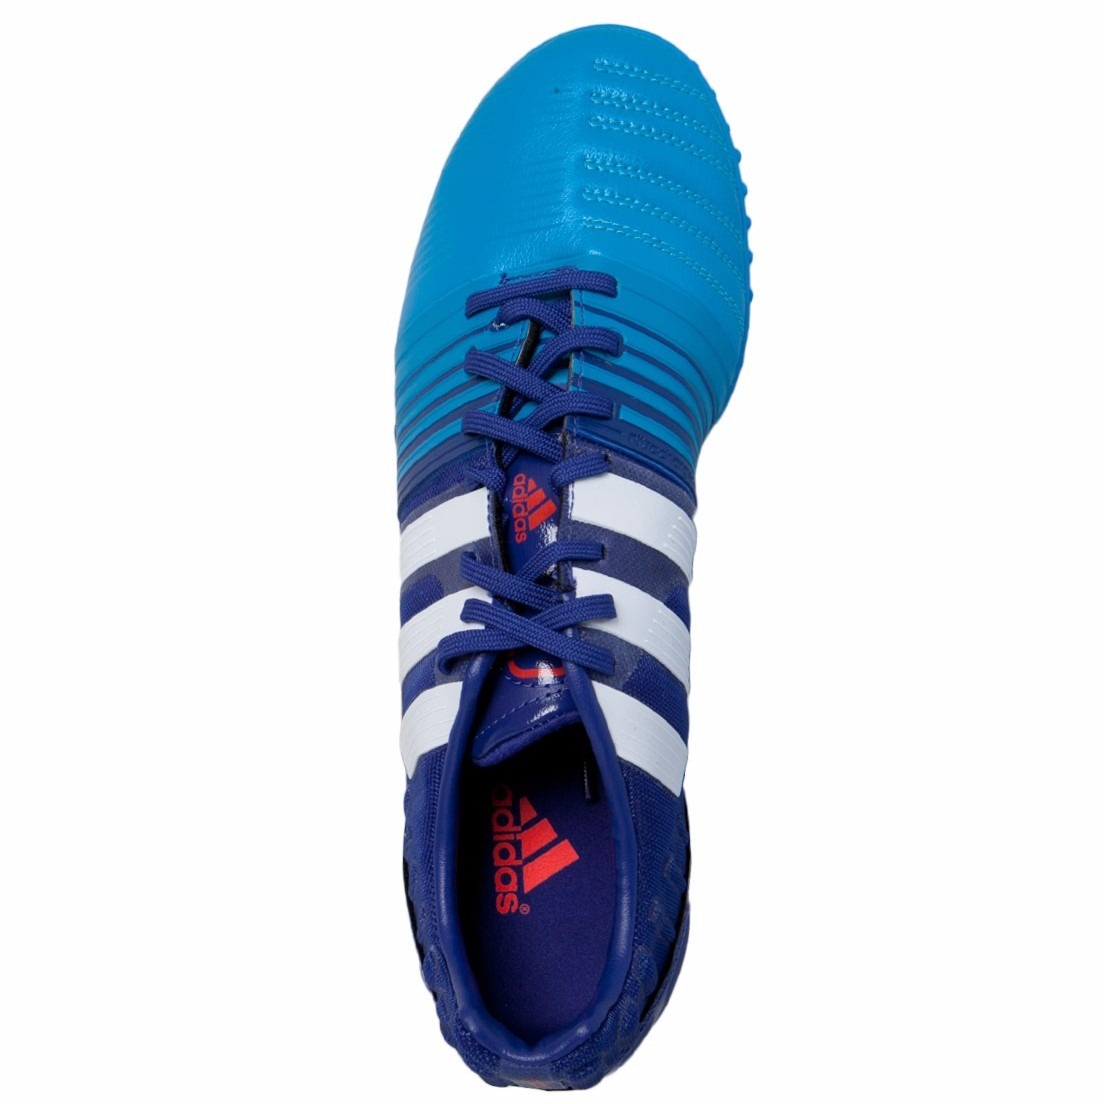 chuteira society tf adidas nitrocharge 2.0 azul tam 41 nova. Carregando zoom . 37d77324c573d